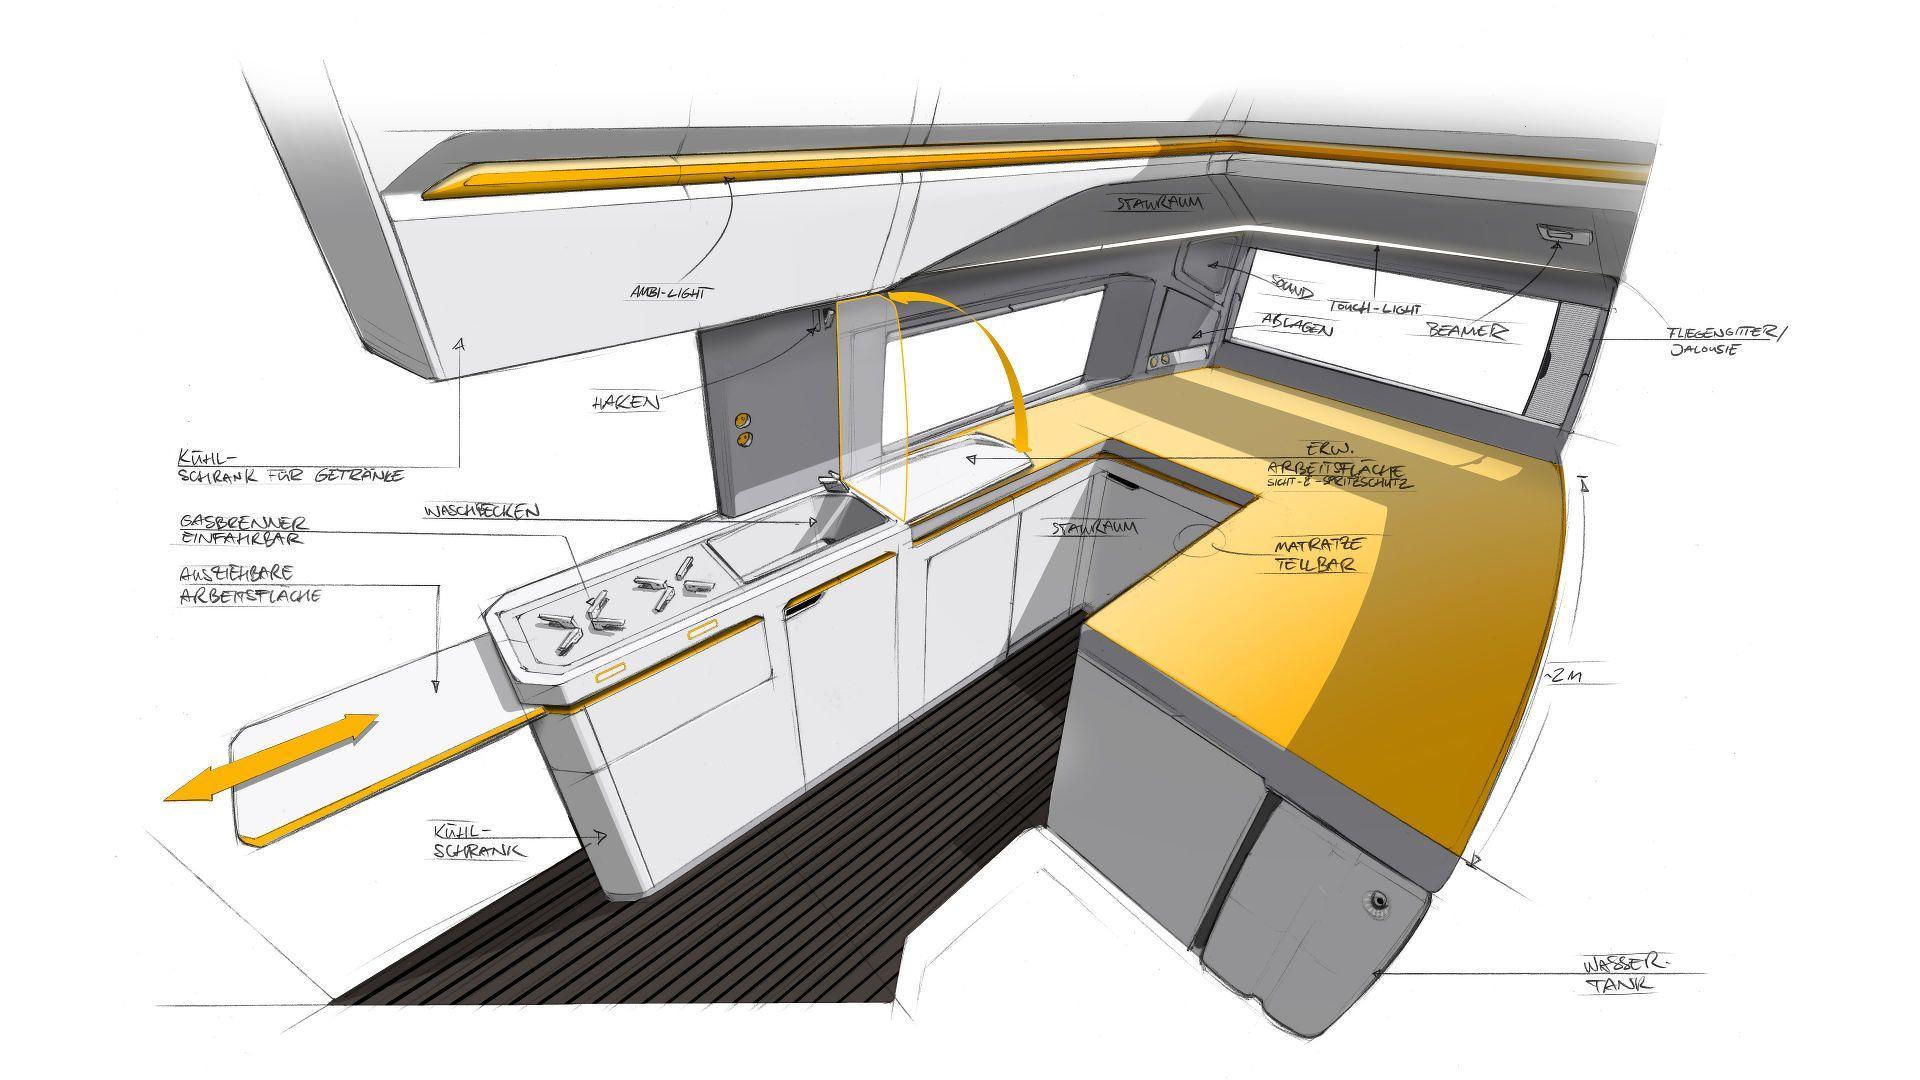 Vw California Xxl Concept Camper Set For Production